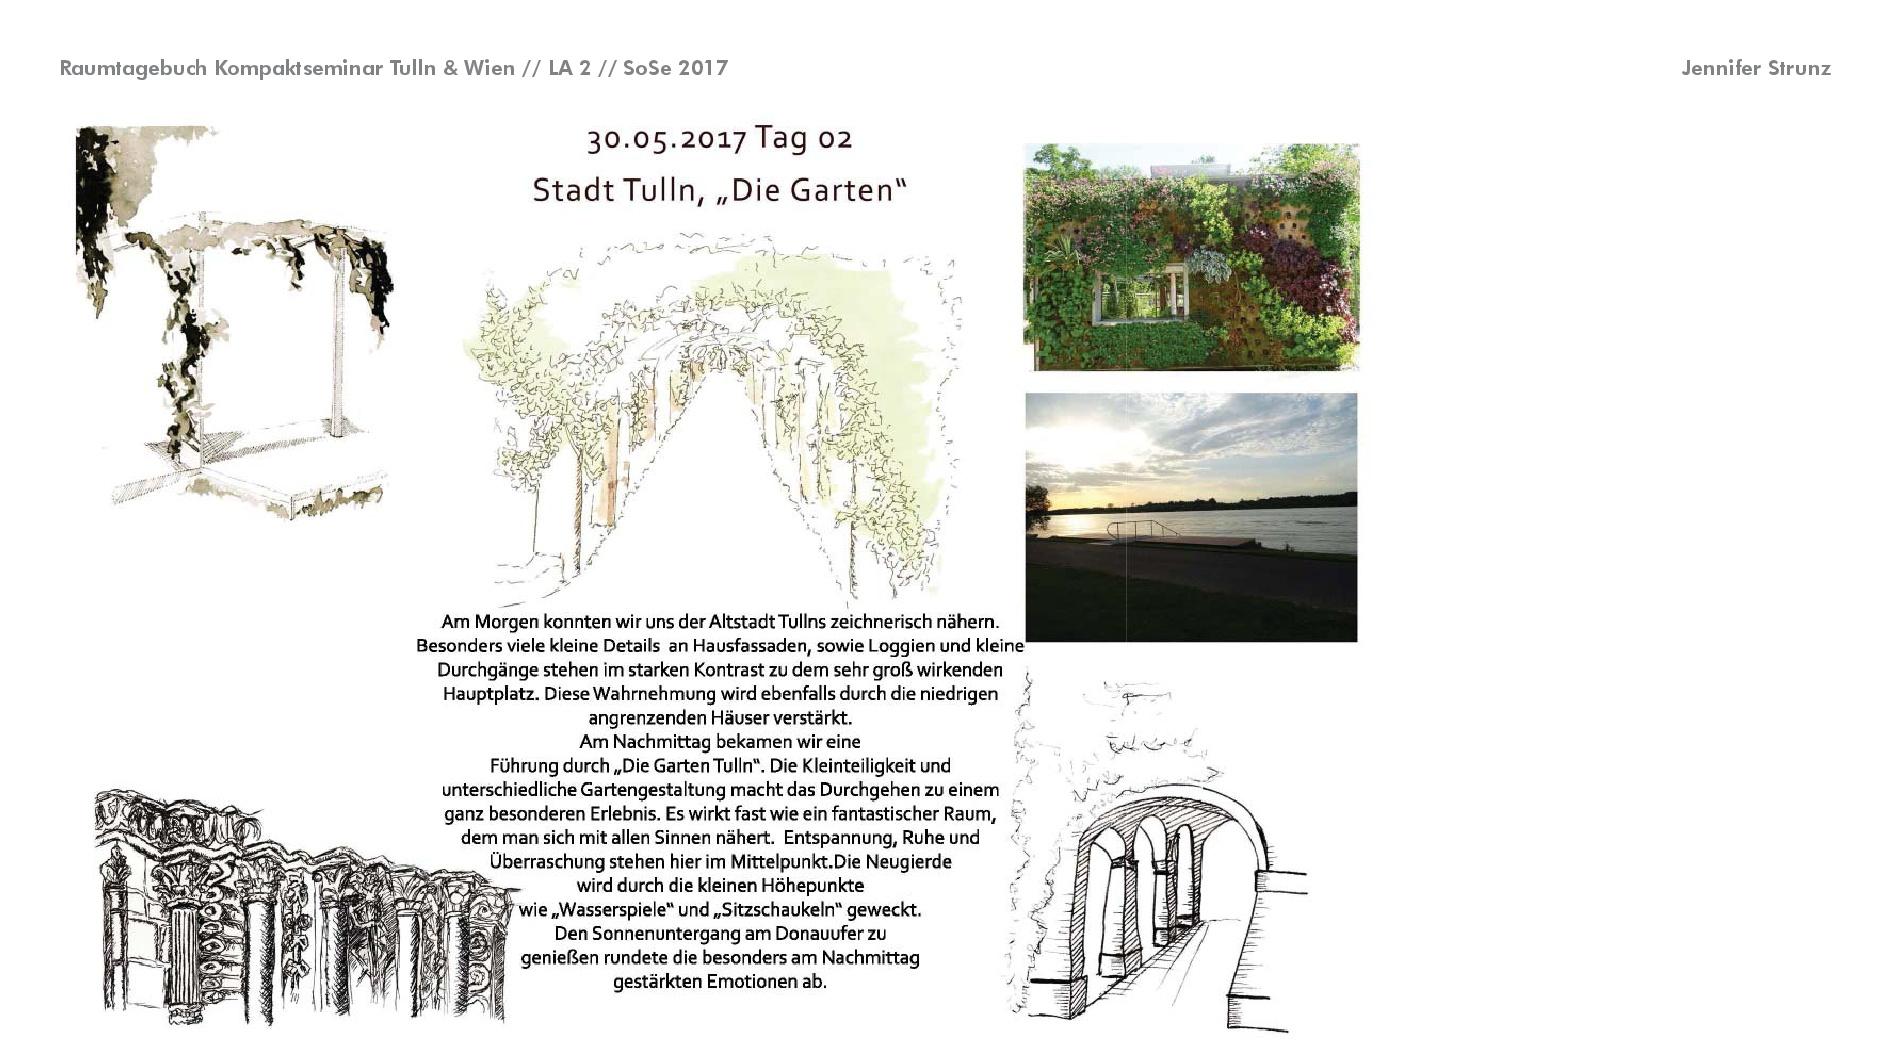 NEU Screen Raumtagebuch Tulln Wien SoSe 17 028